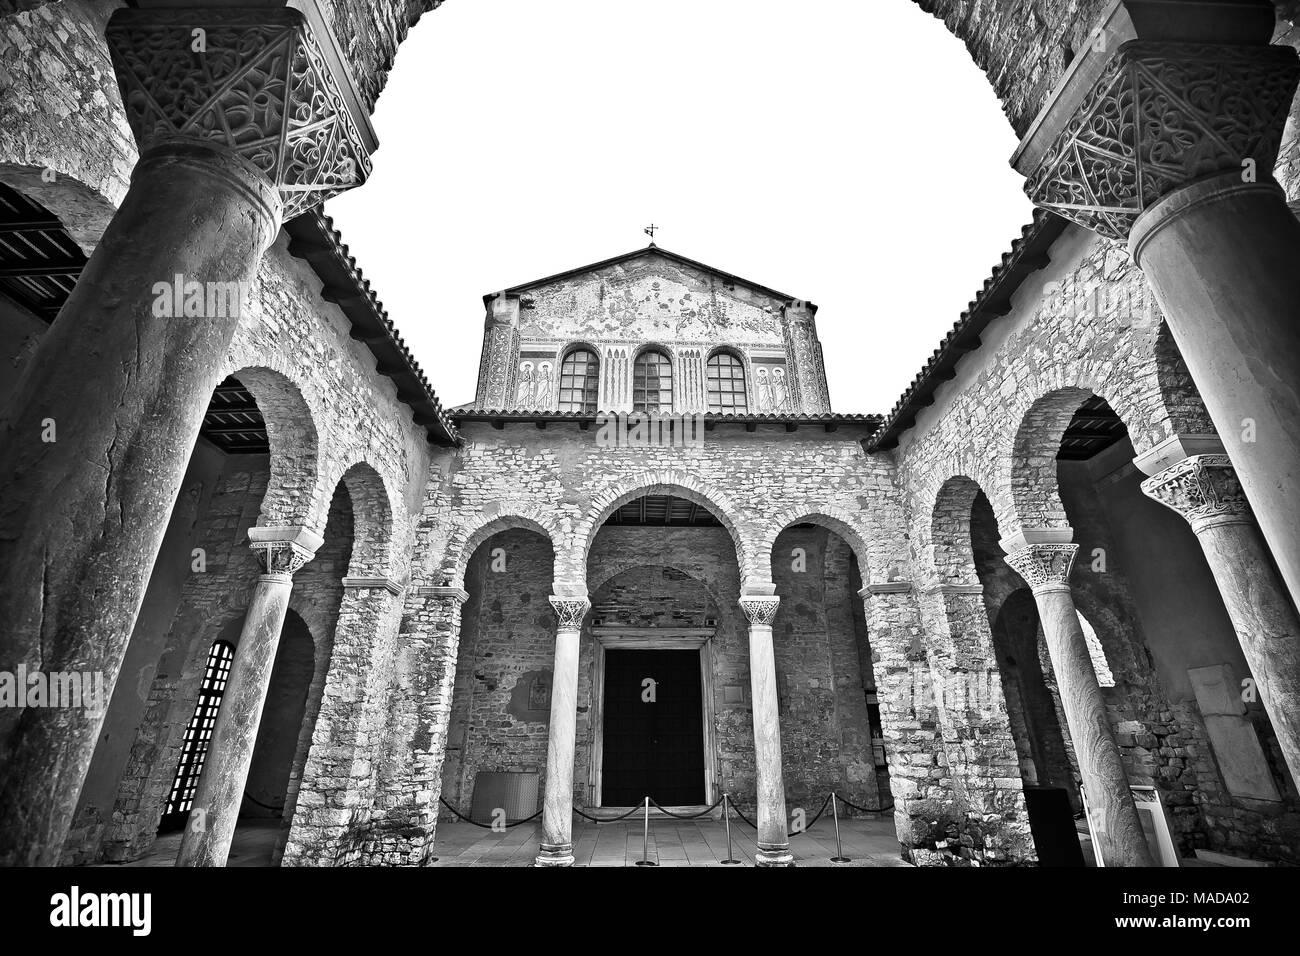 Euphrasian Basilica in Porec arcades black and white view, UNESCO world heritage site in Istria, Croatia - Stock Image